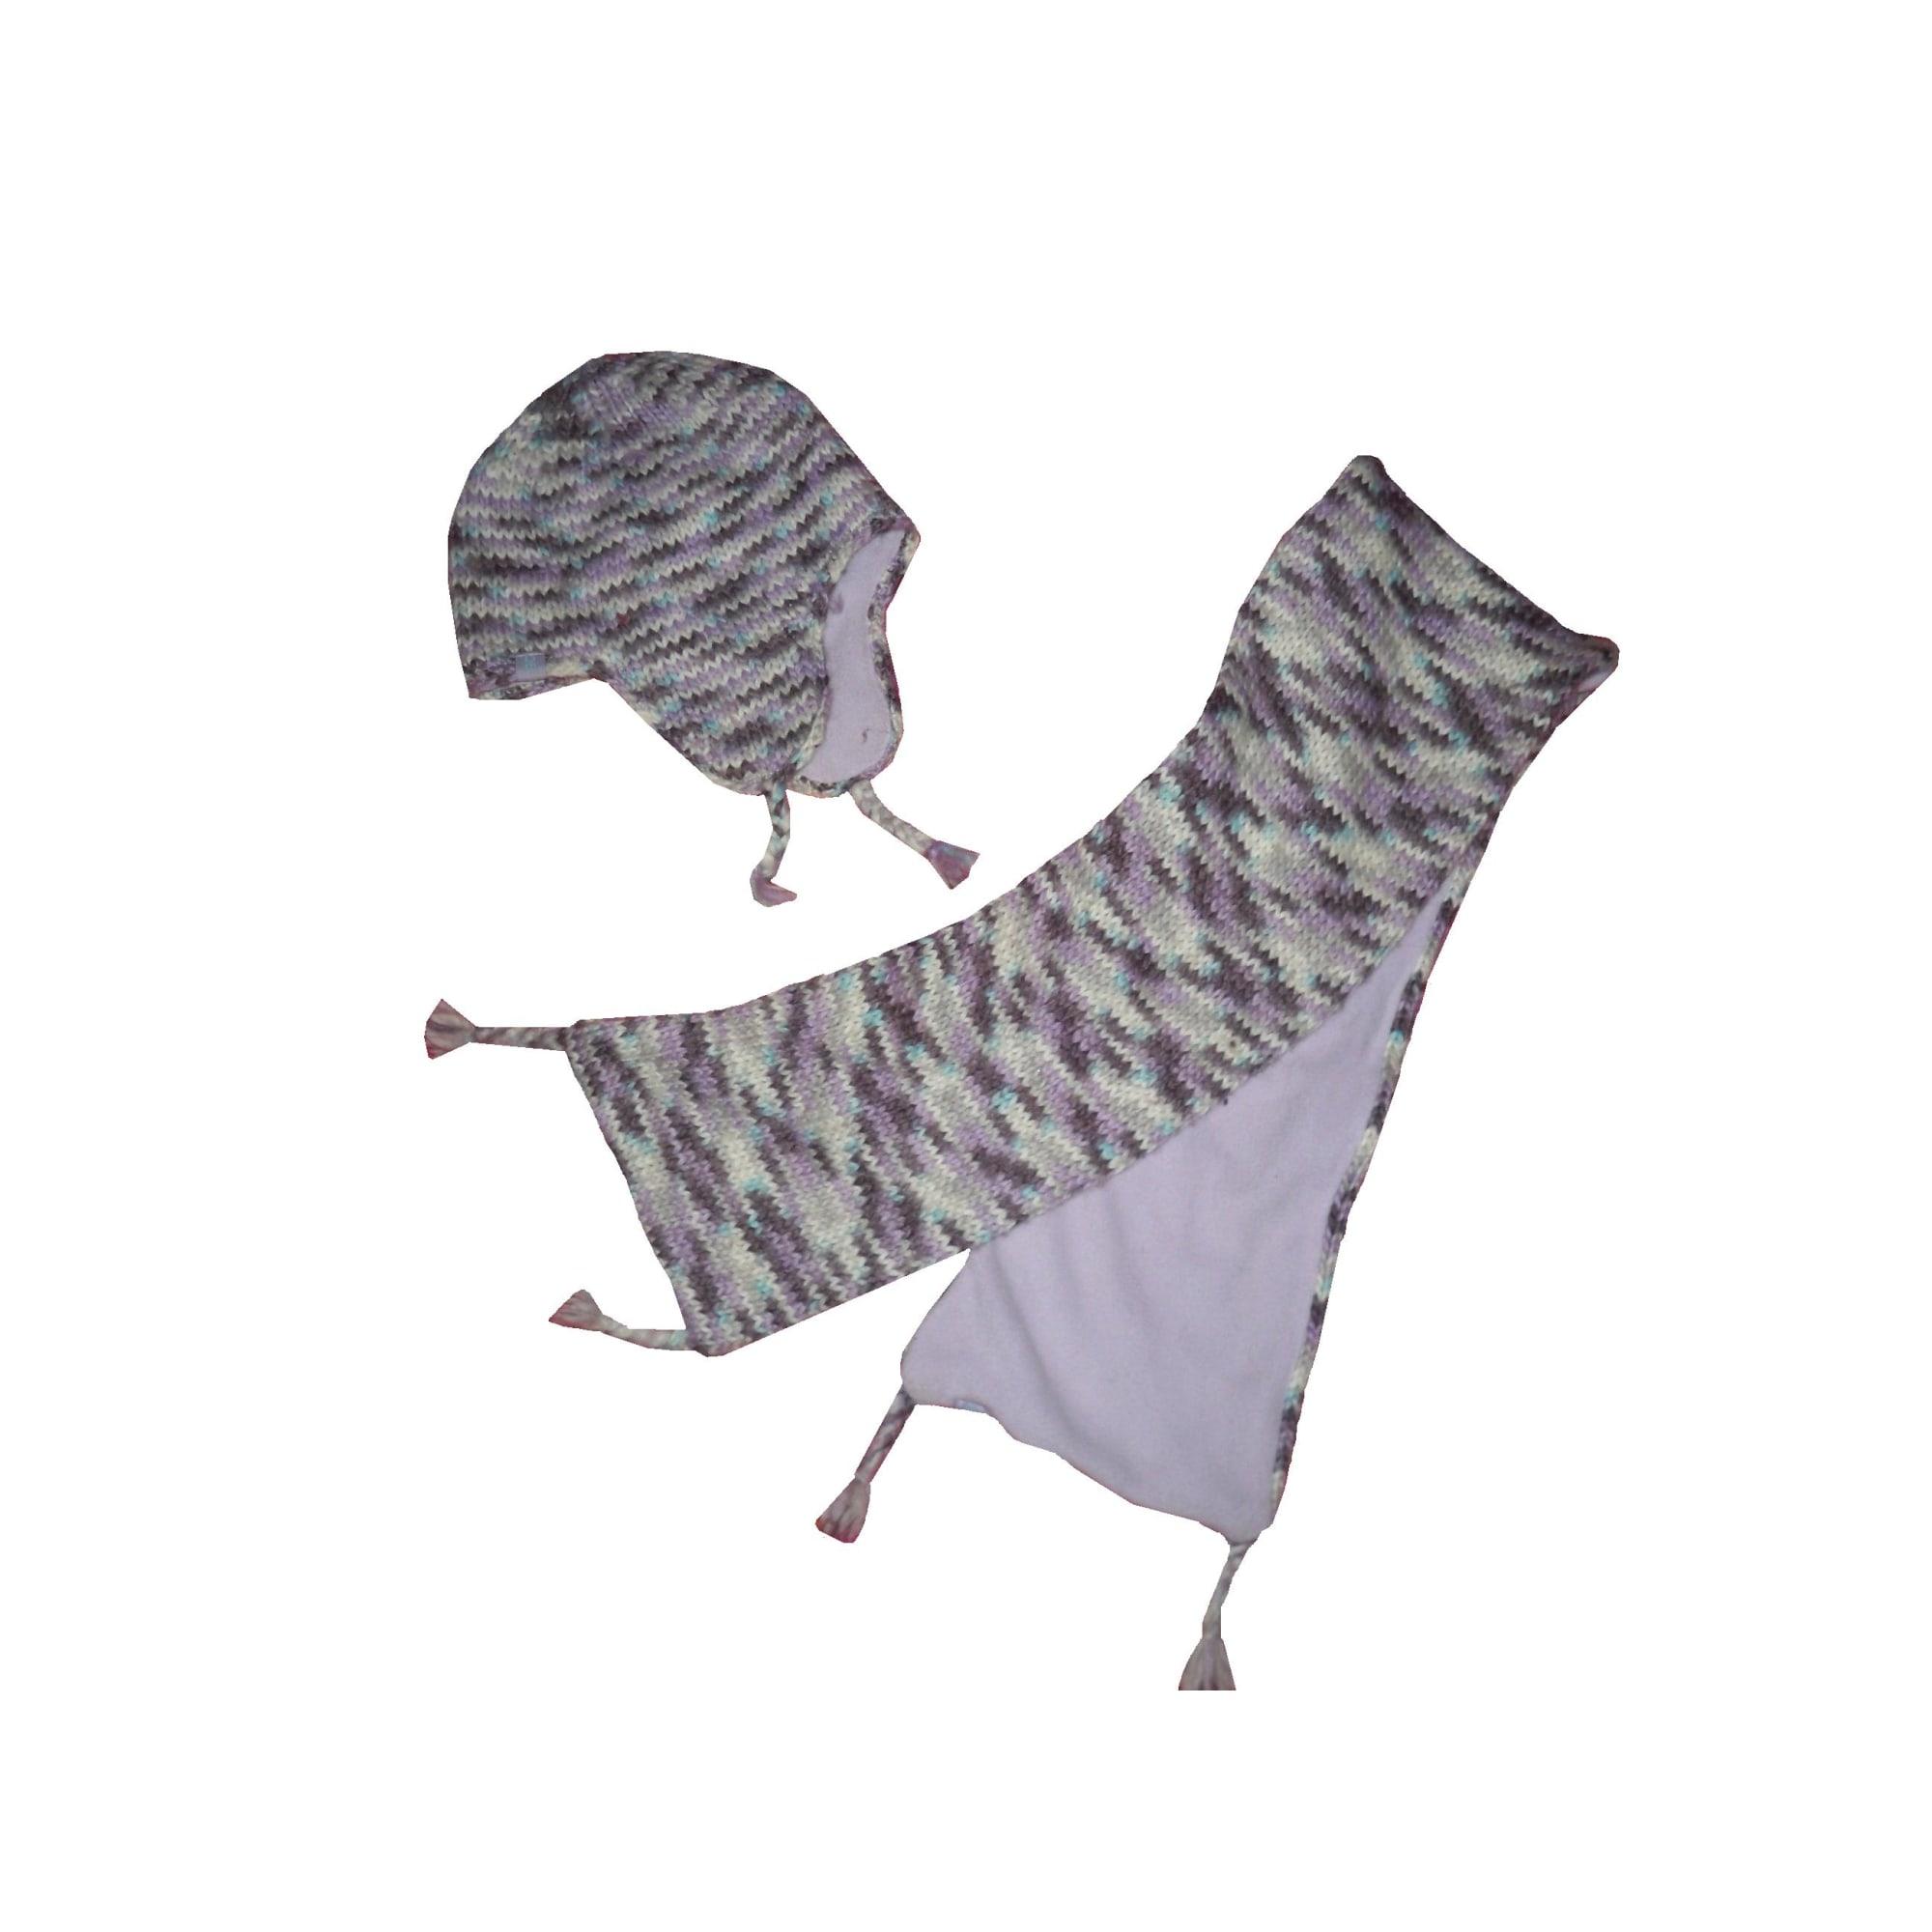 Bonnet OKAÏDI 5-6 ans multicouleur - 1940871 97fc088dd06